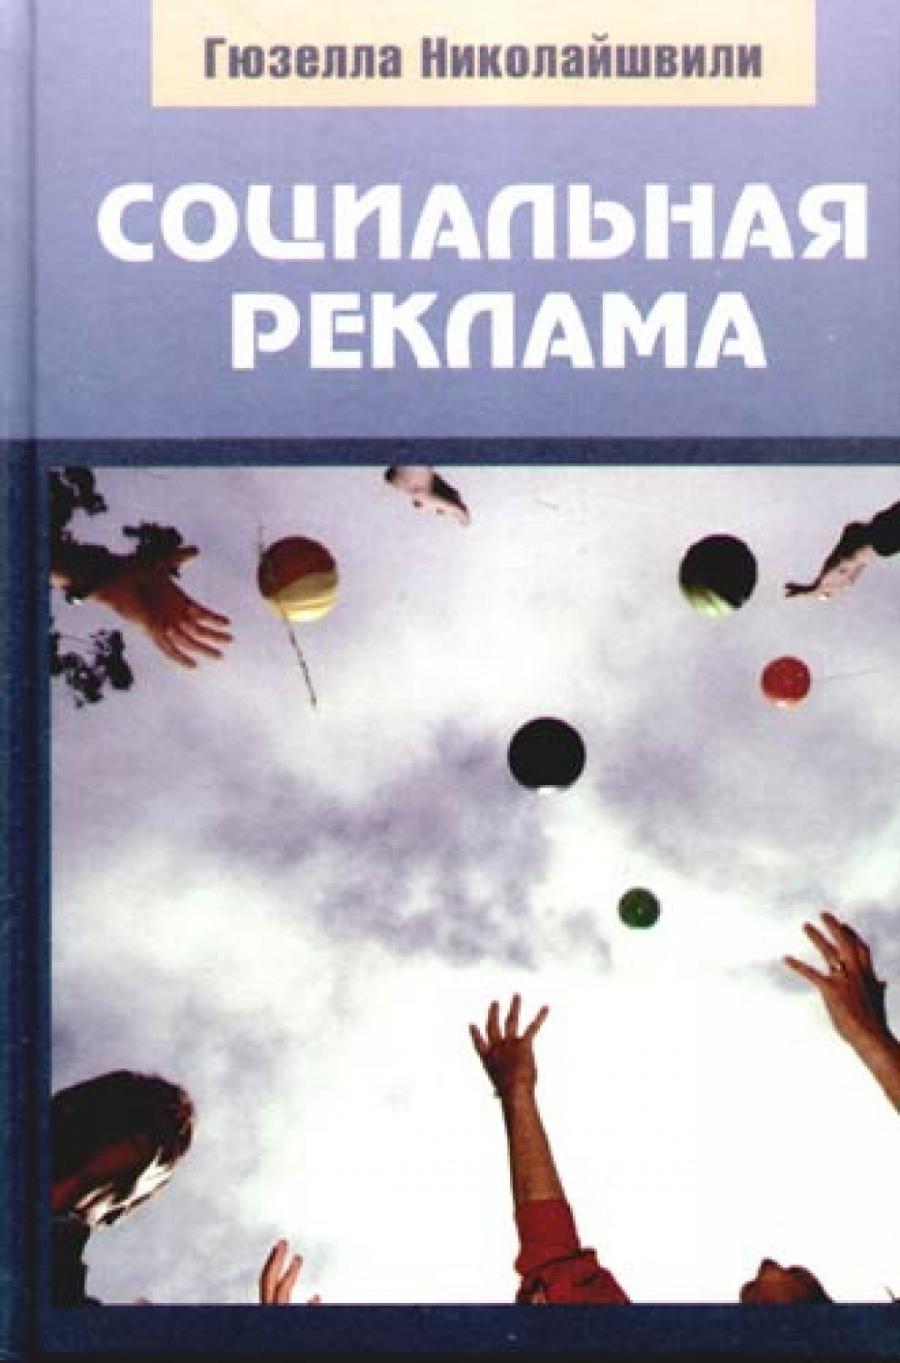 Обложка книги:  николайшвили г.г. - социальная реклама. теория и практика